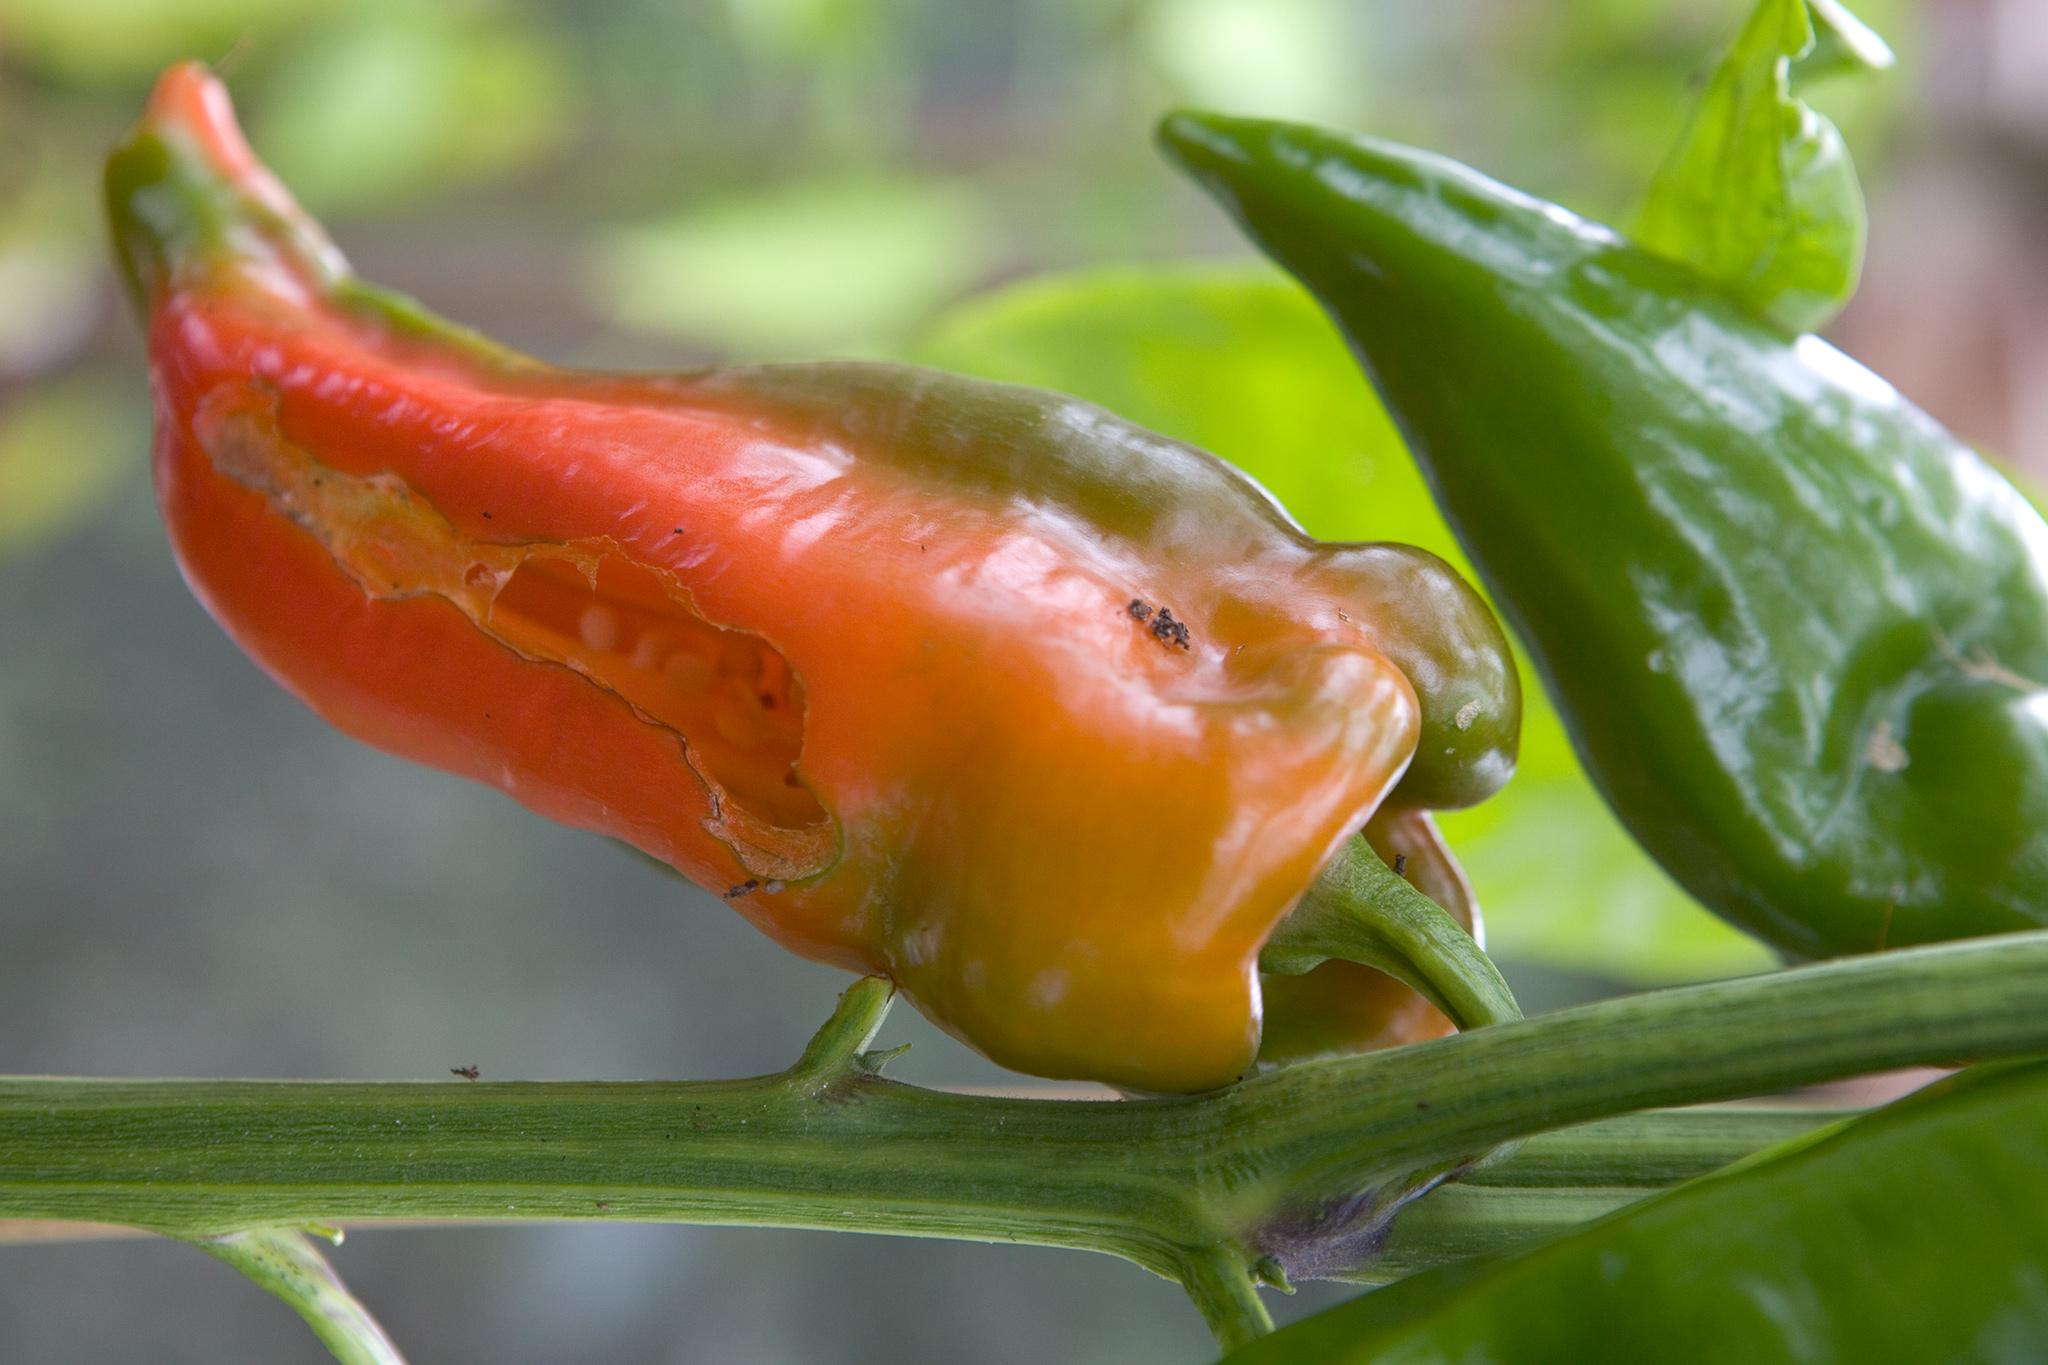 slug-damage-to-pepper-2